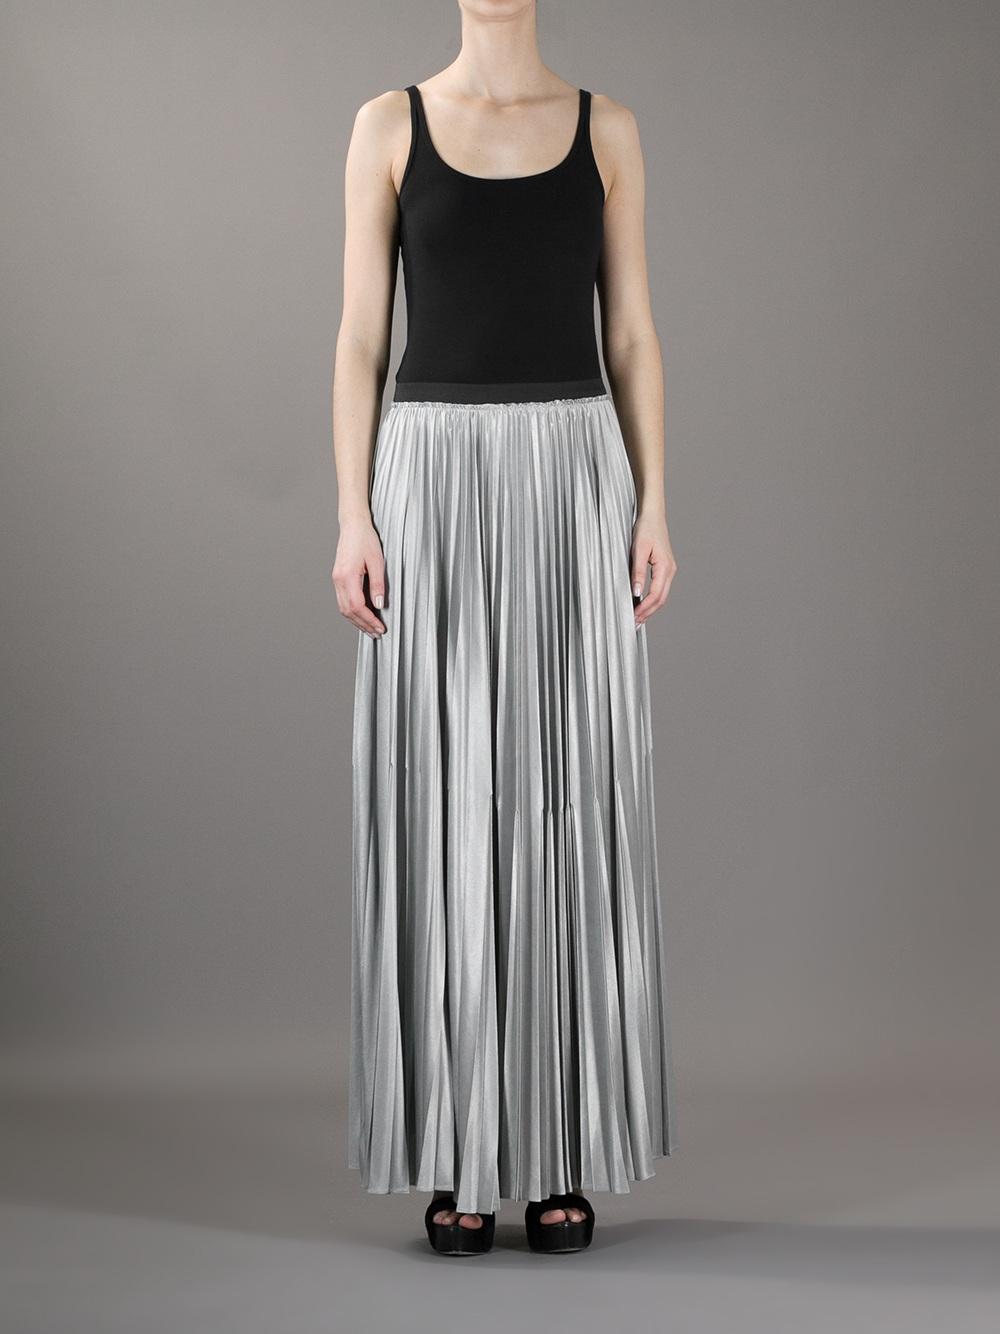 Enza costa Pleated Maxi Skirt in Metallic | Lyst